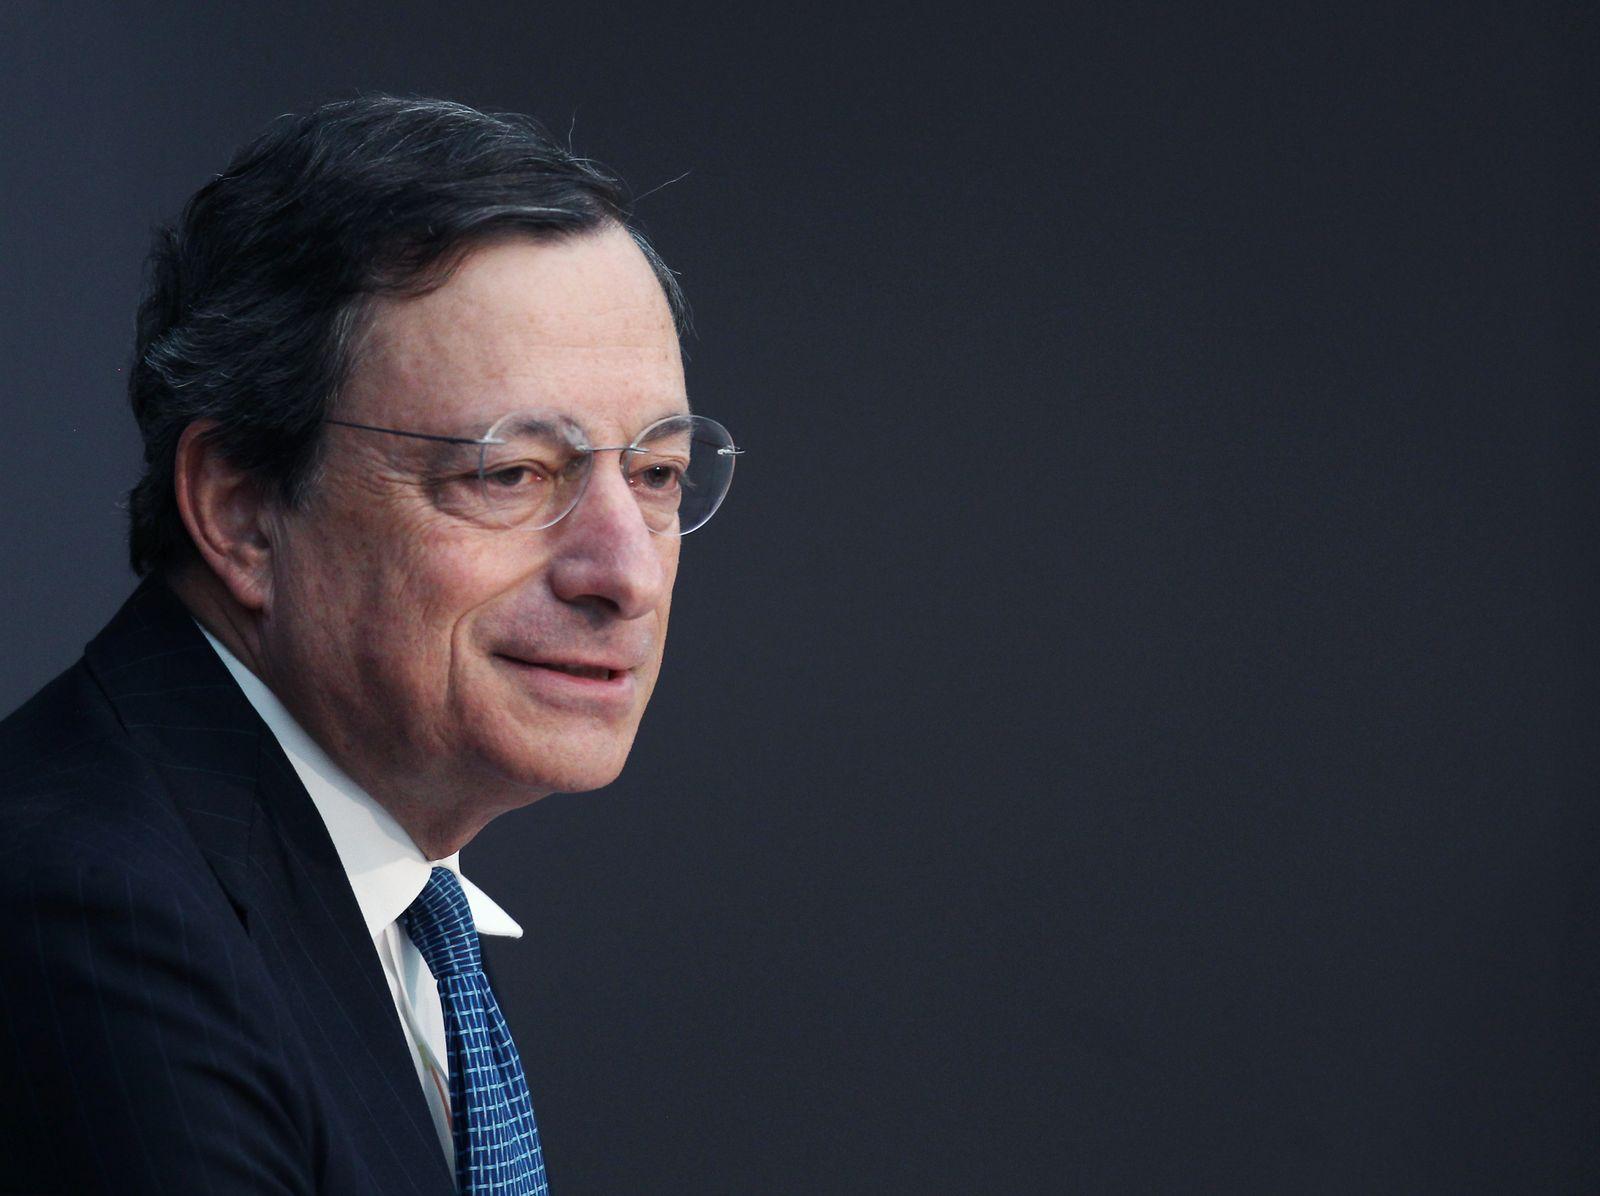 Europäische Zentralbank / Mario Draghi